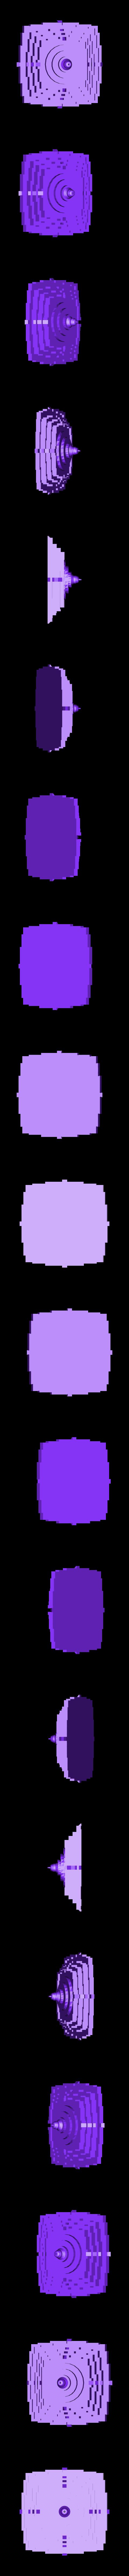 570b8c99 cf51 4613 93d7 9806a0261982